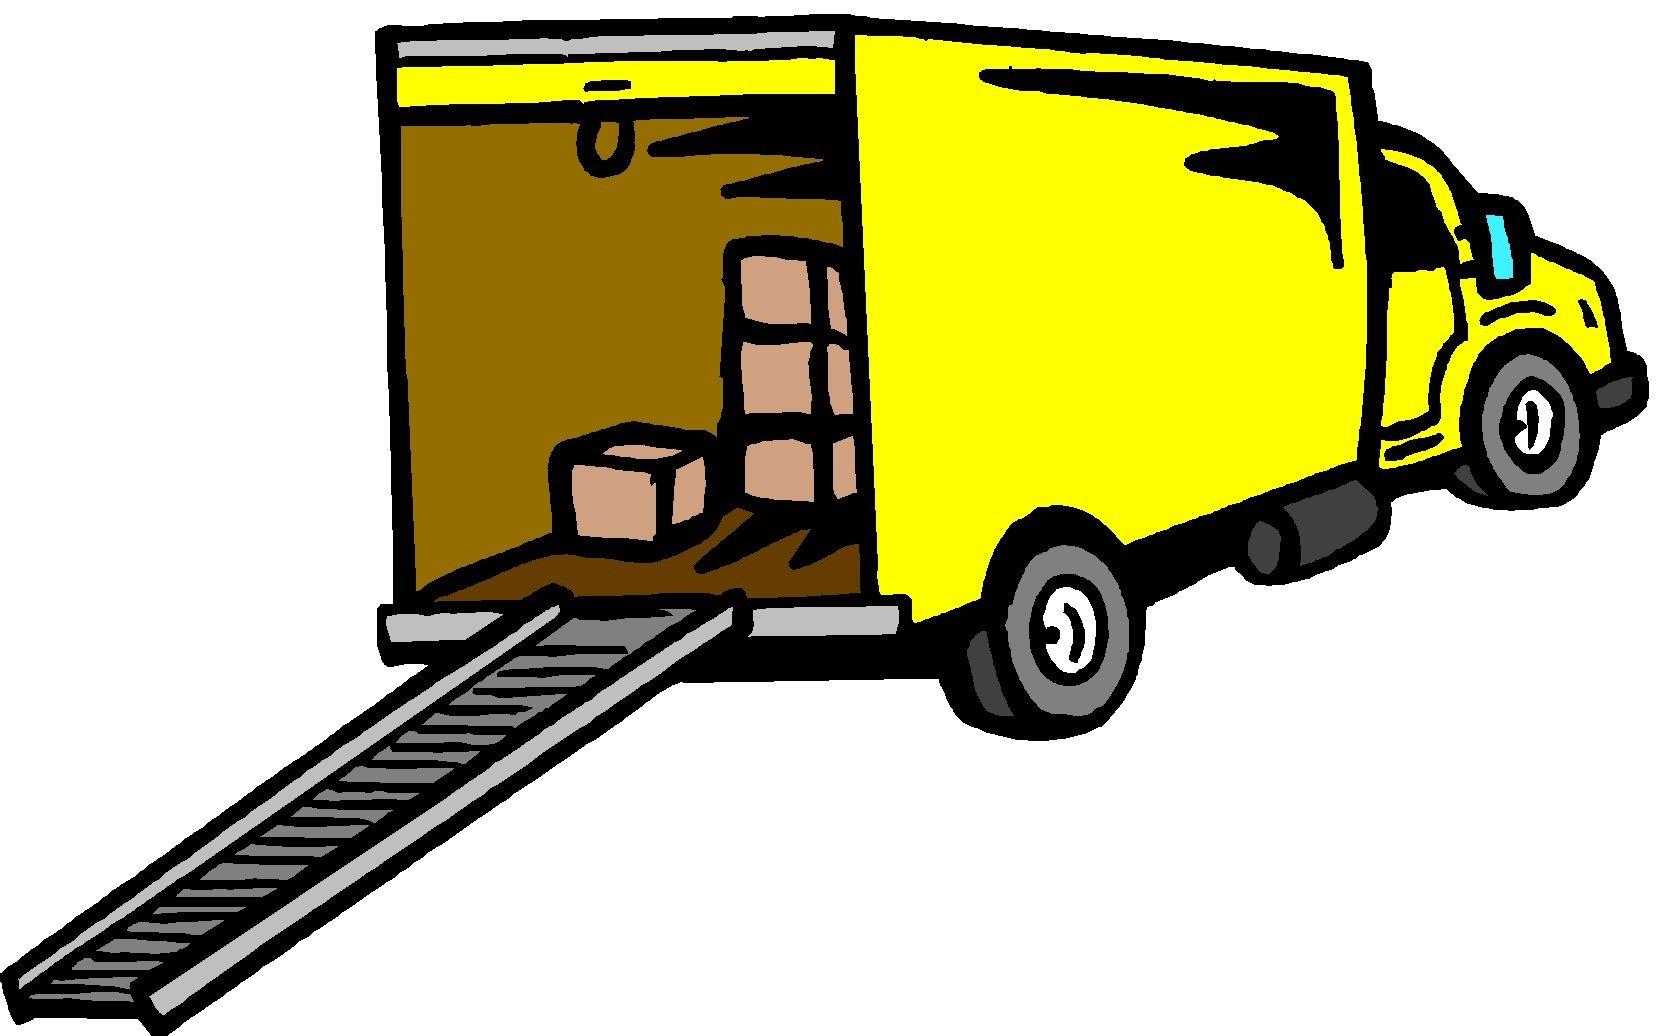 1665x1036 Edcabdbf4efeacc Moving Truck Clipart